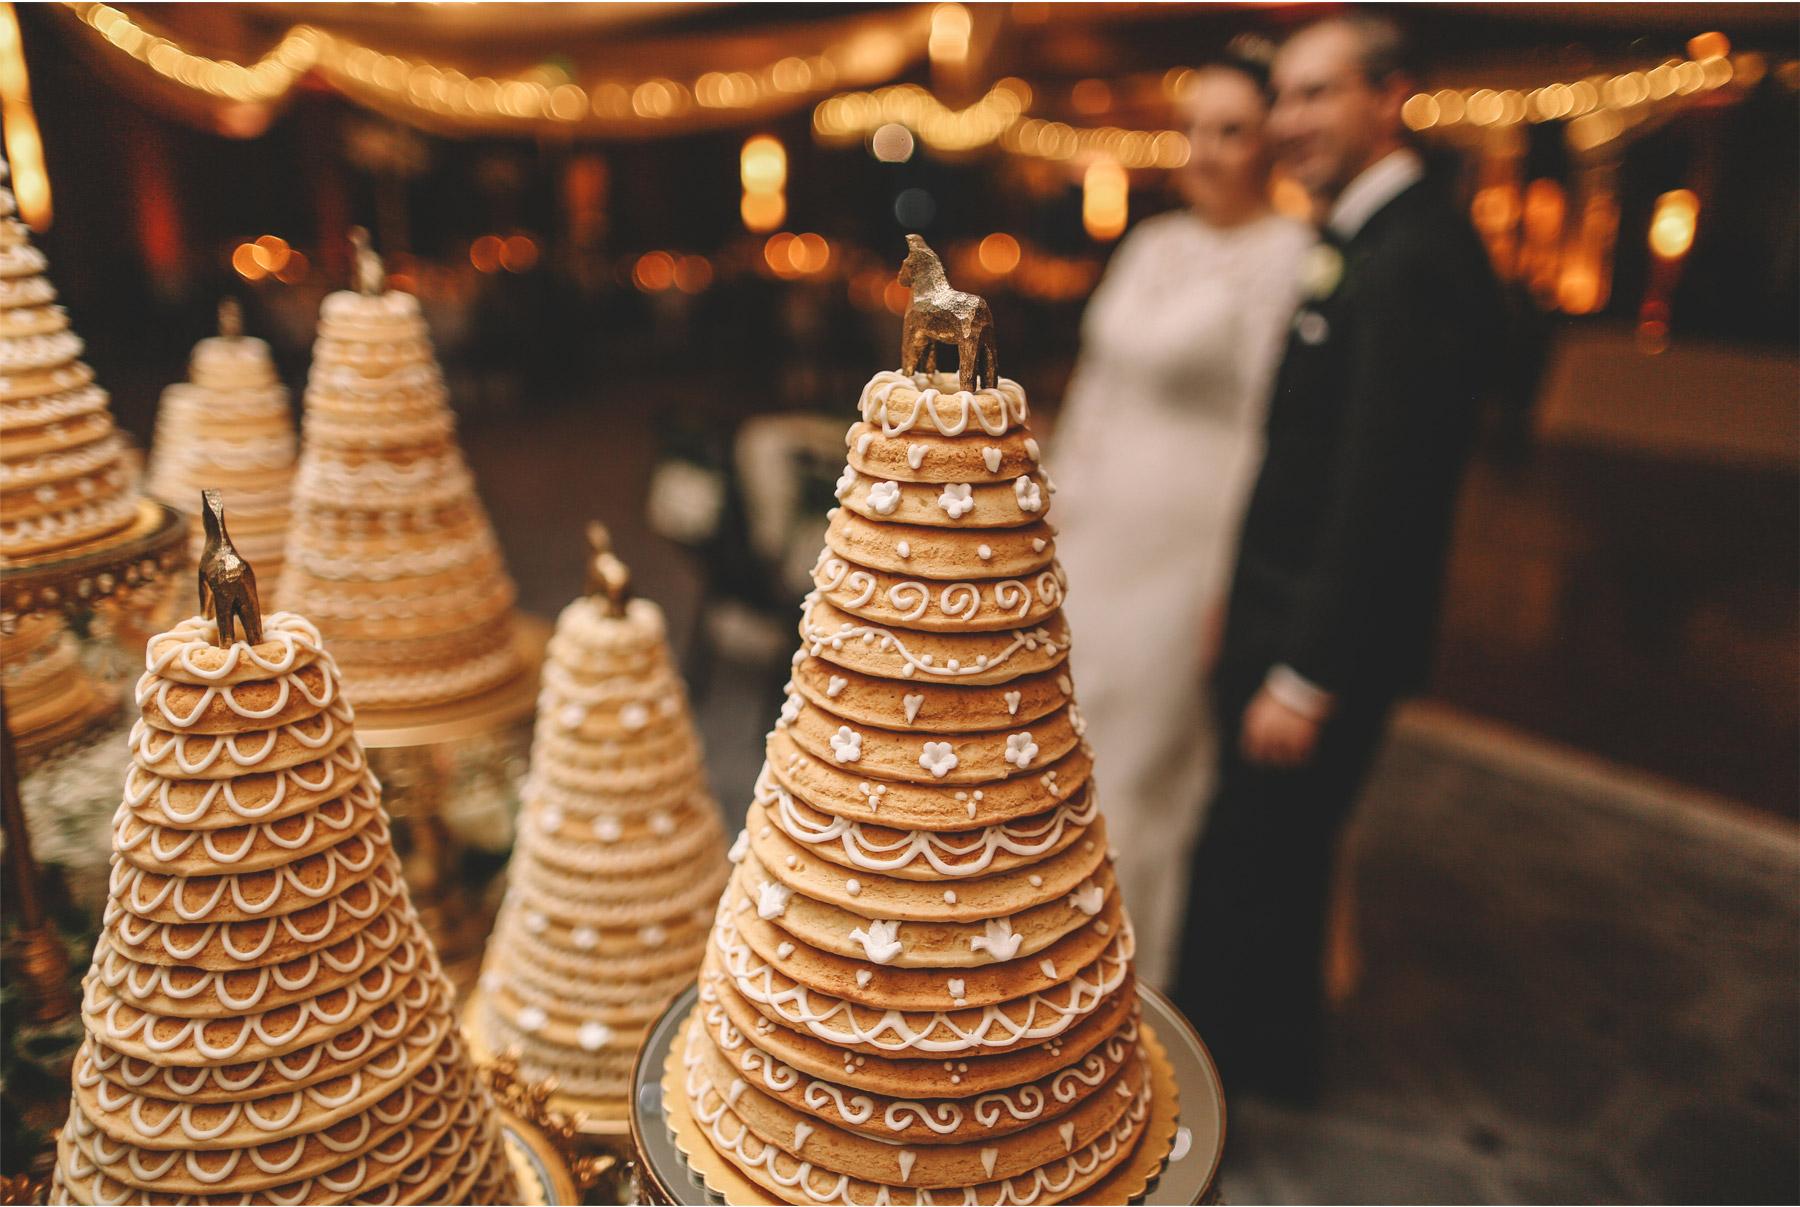 16-Minneapolis-Minnesota-Wedding-Photography-by-Vick-Photography-Downtown-Windows-on-Minnesota-Reception-Cake-Table-Anja-and-Waseem.jpg